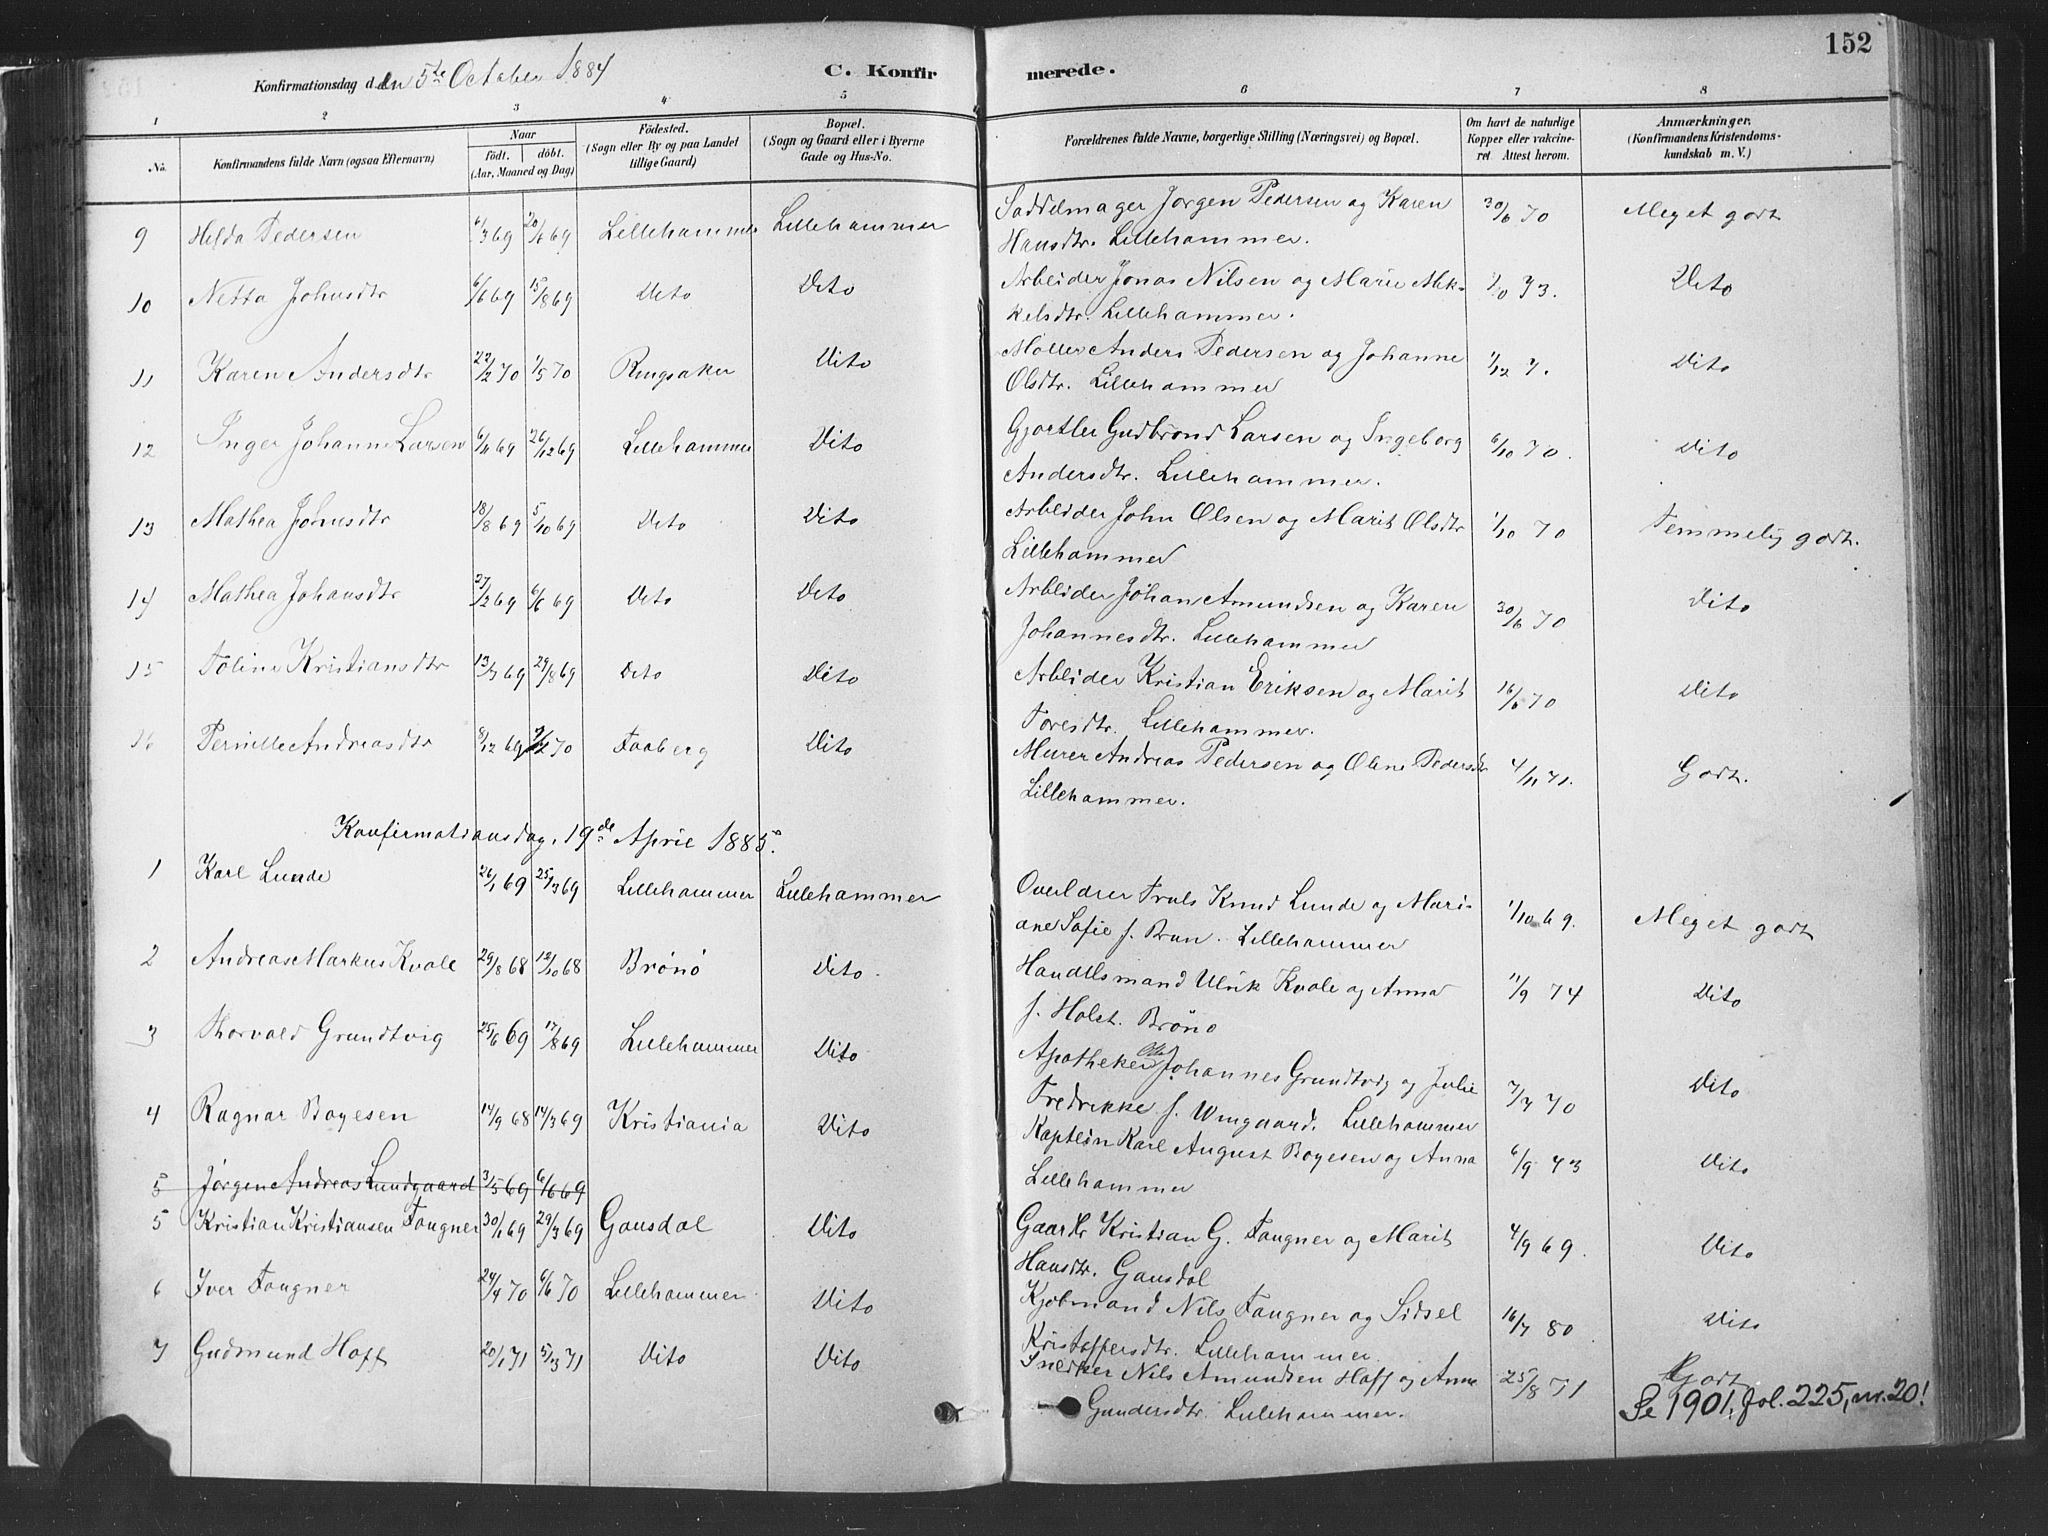 SAH, Fåberg prestekontor, H/Ha/Haa/L0010: Parish register (official) no. 10, 1879-1900, p. 152